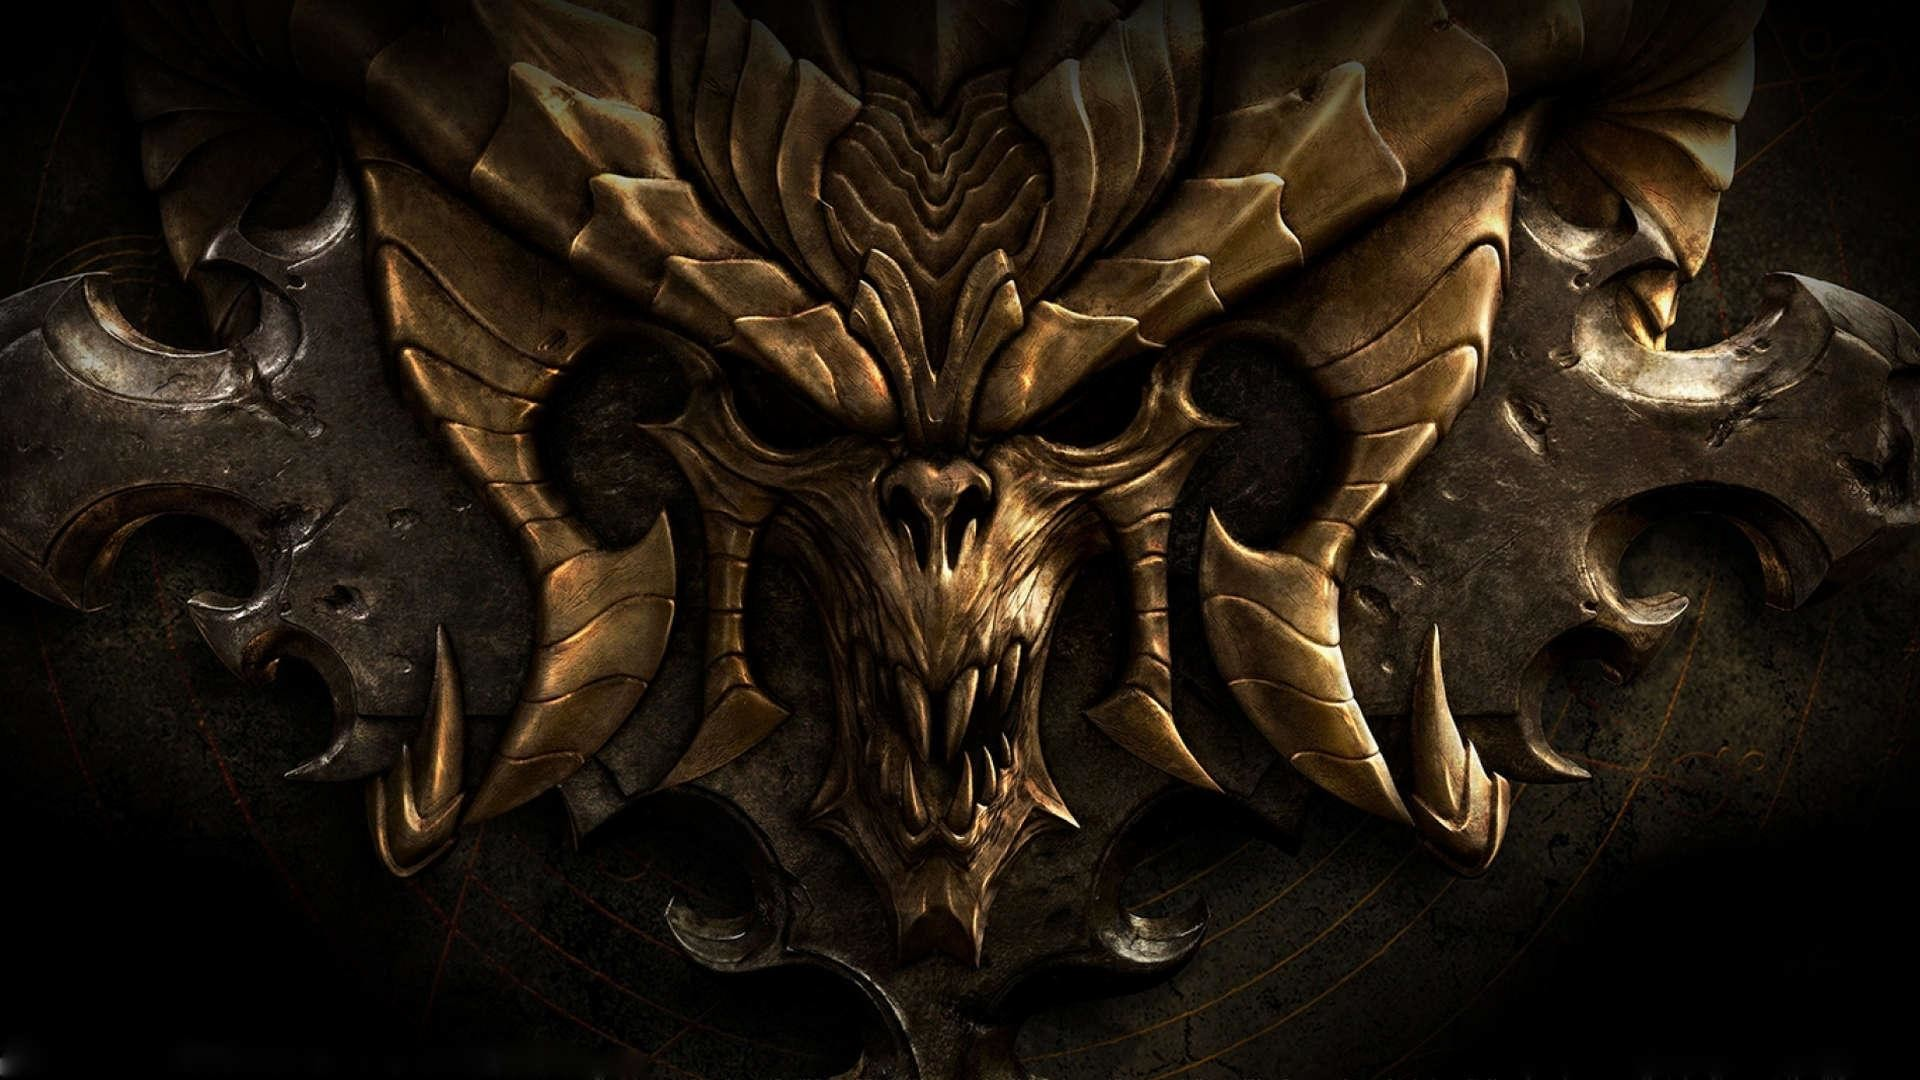 HD Diablo 3 Wallpaper (77+ pictures)